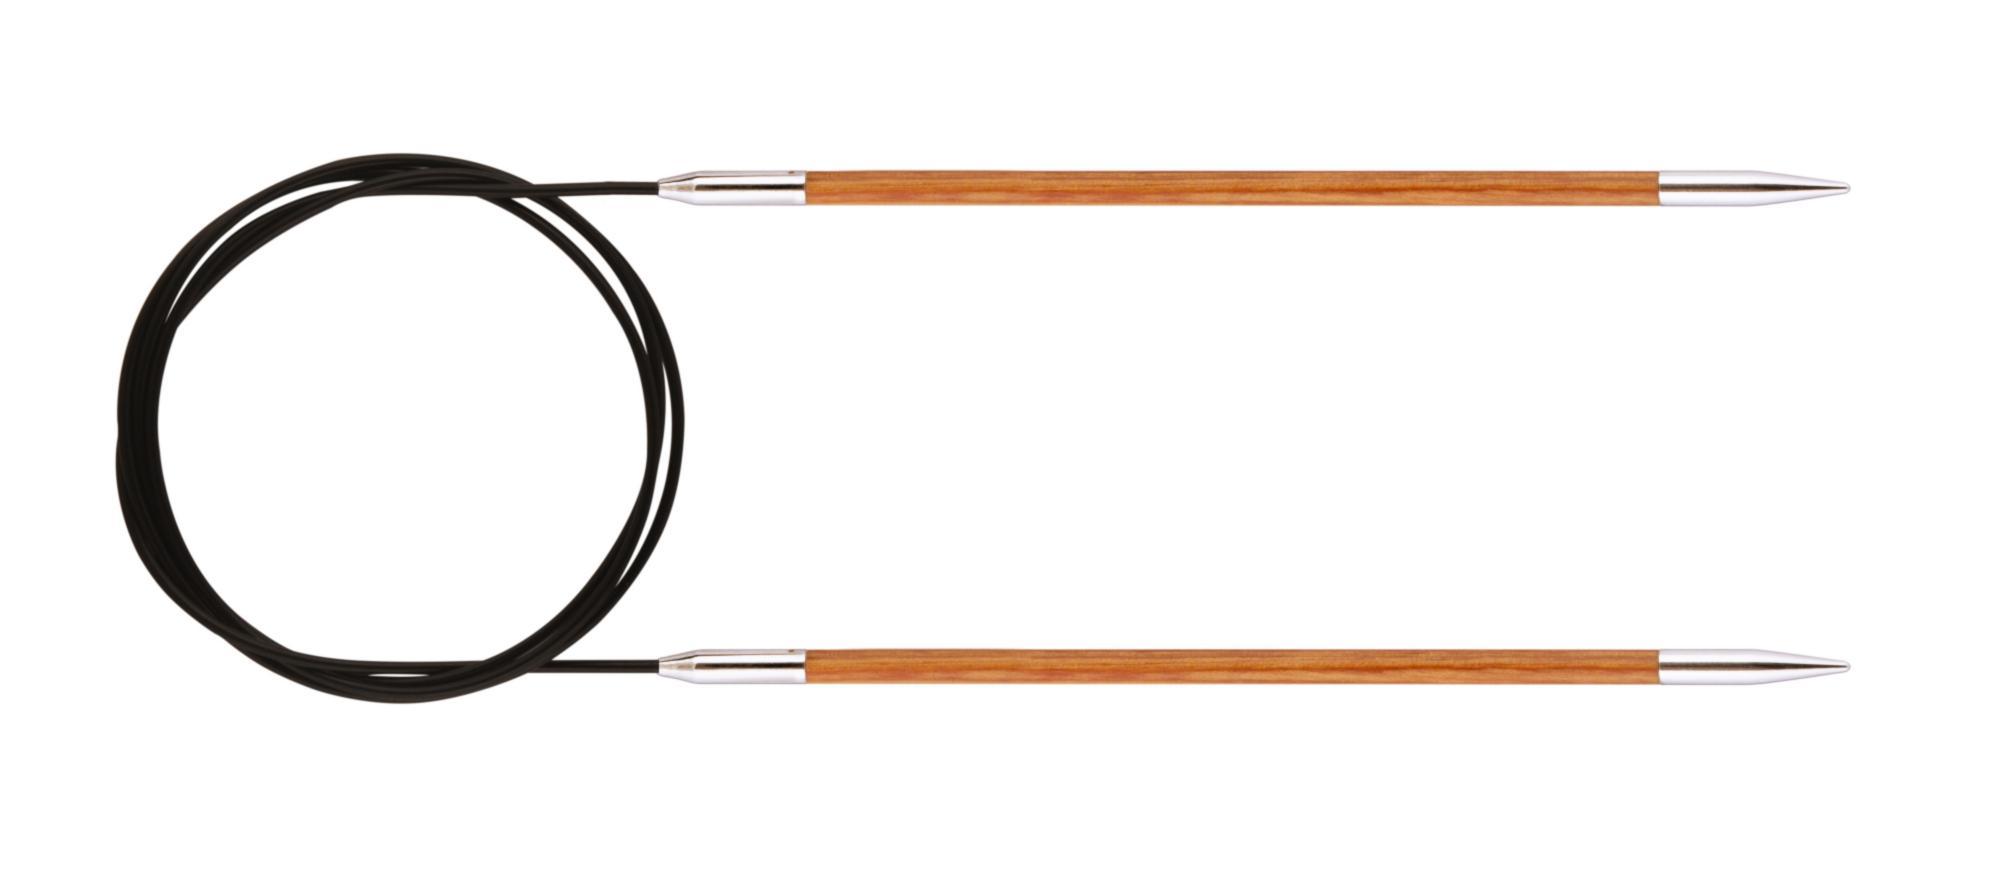 Спицы круговые 100 см Royale KnitPro, 29114, 3.75 мм